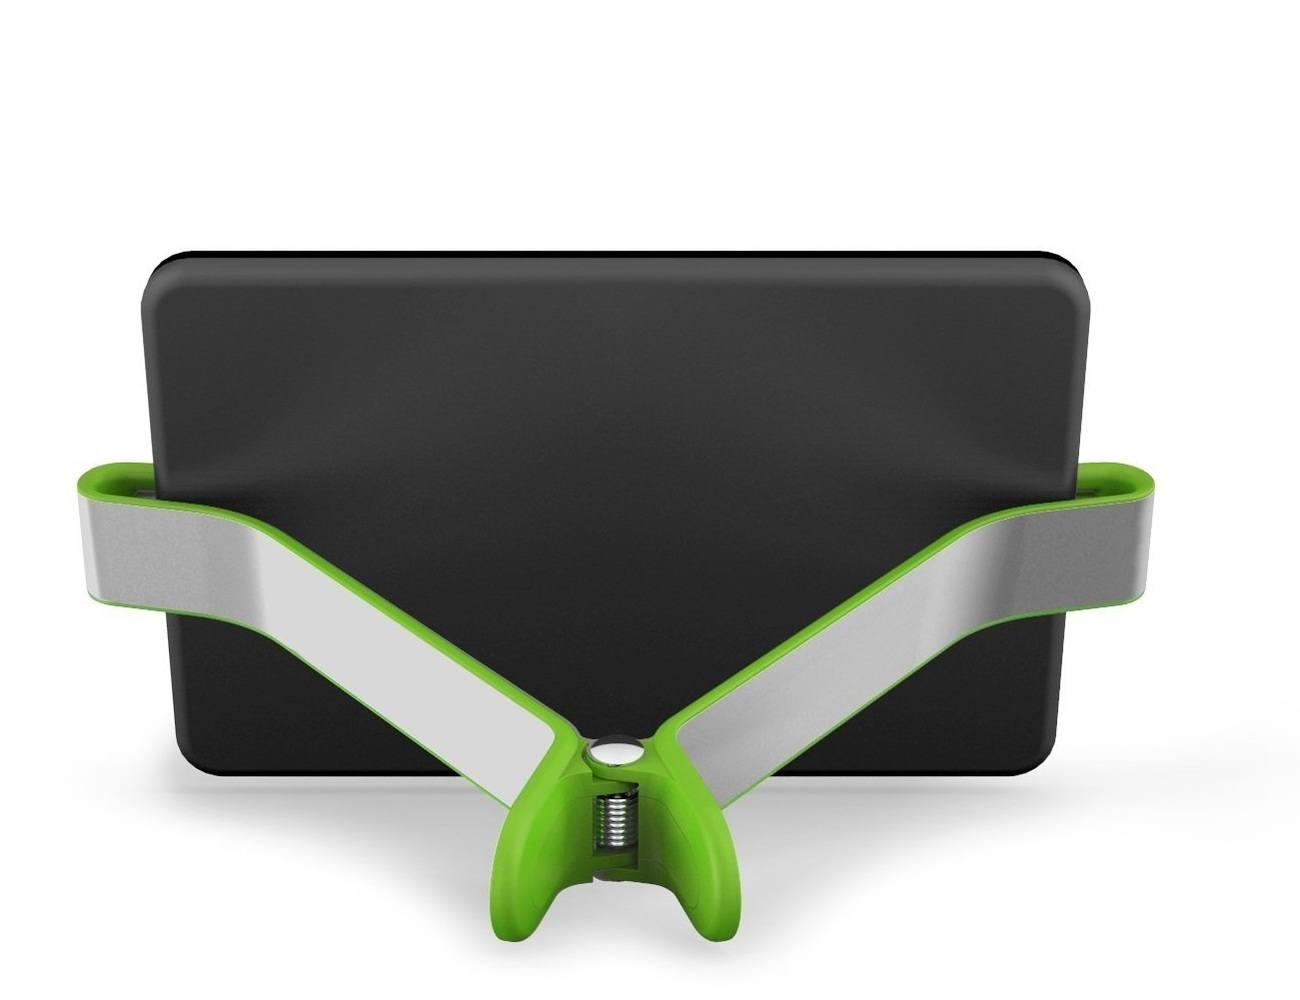 Felix TwoHands Tablet Travel Stand